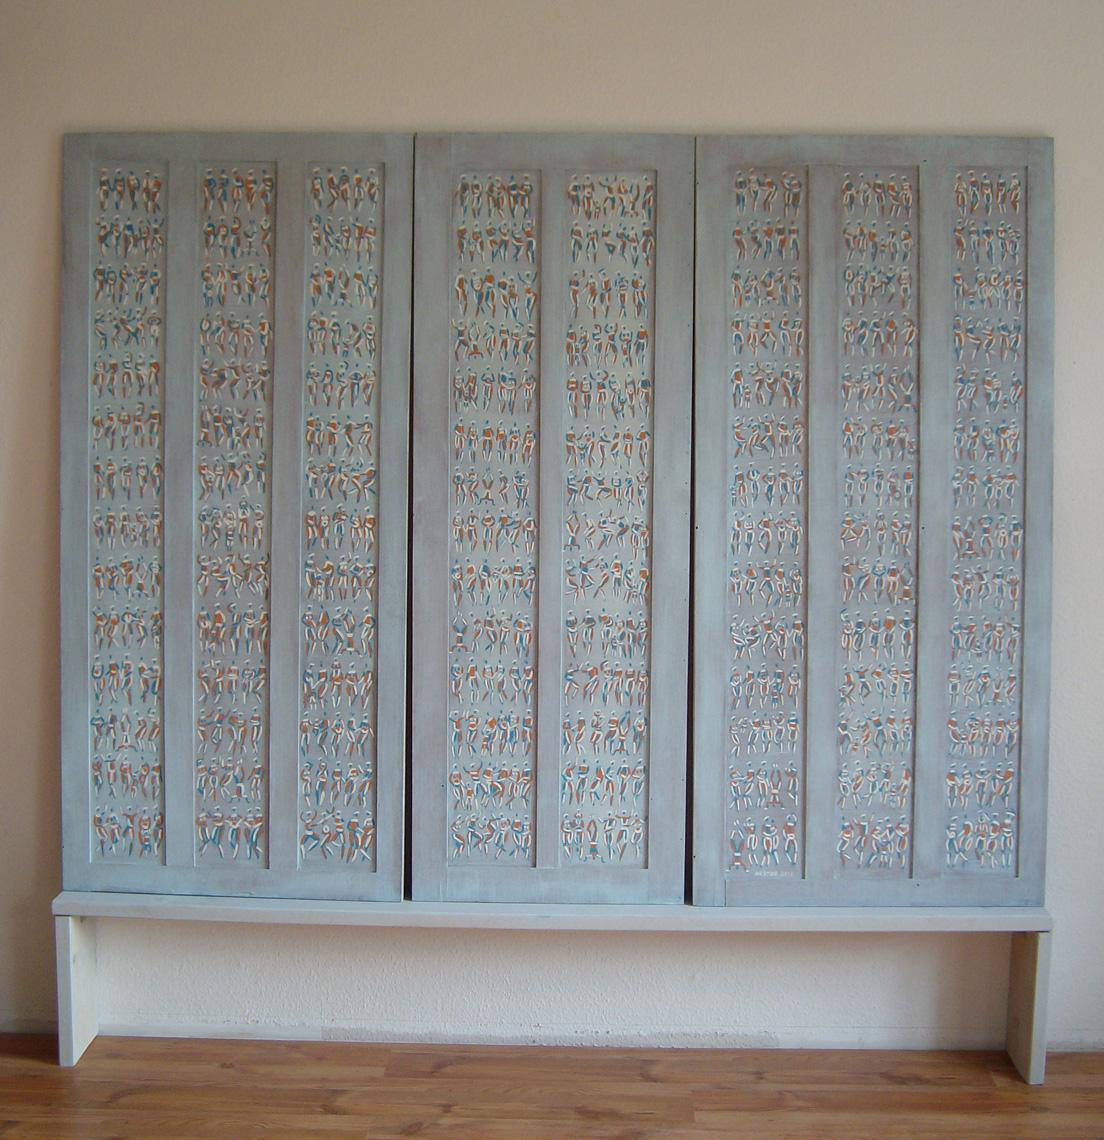 VERKAUFT - Triptychon Tibet, 171x219cm, Öl auf Holz, 1997-2012